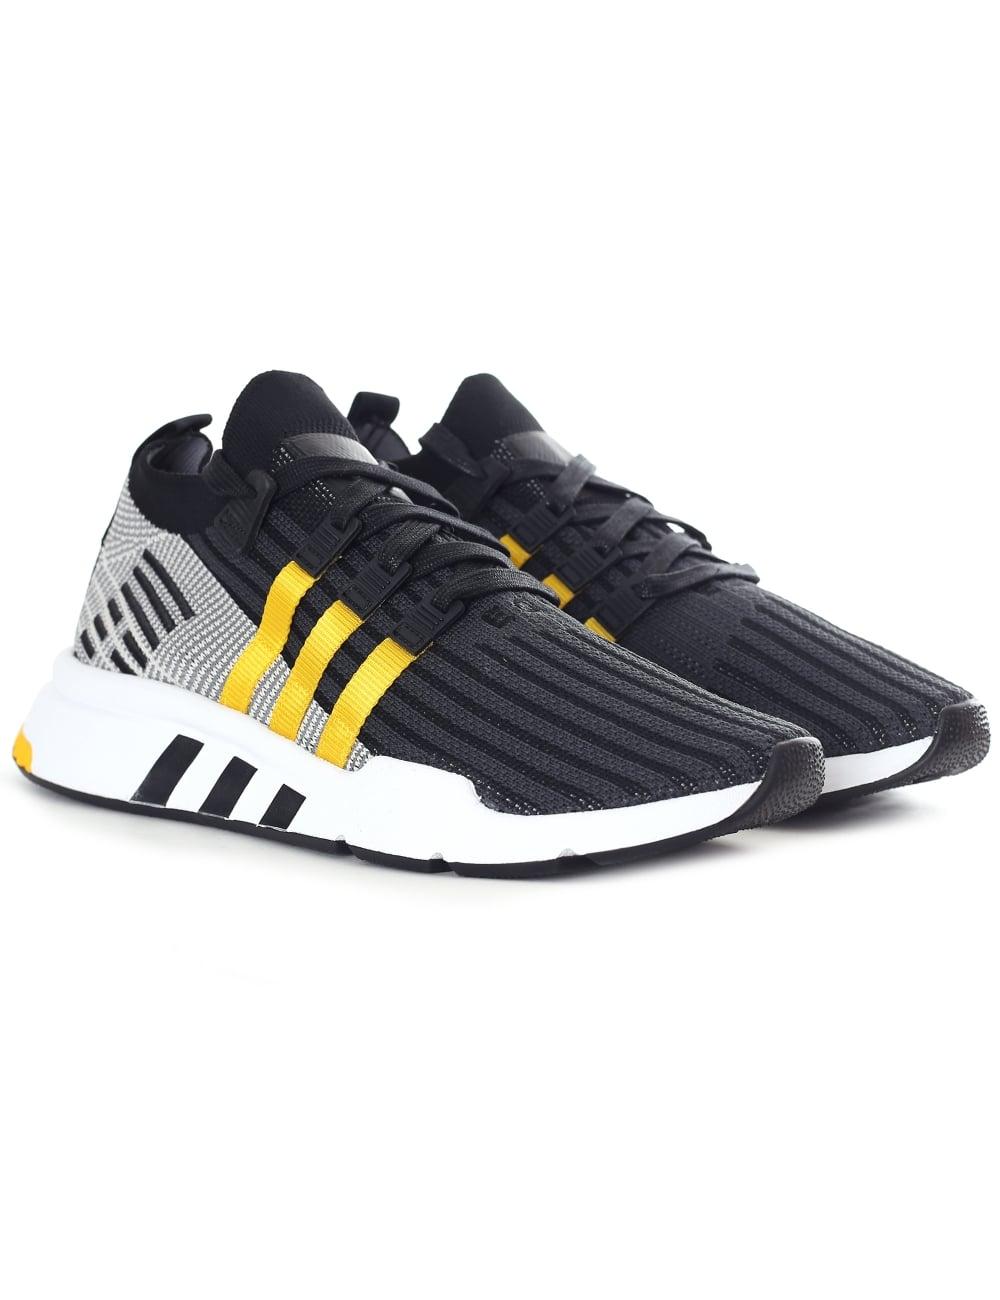 23c62f50b199 Adidas Men s EQT Support Mid ADV Primeknit Trainer